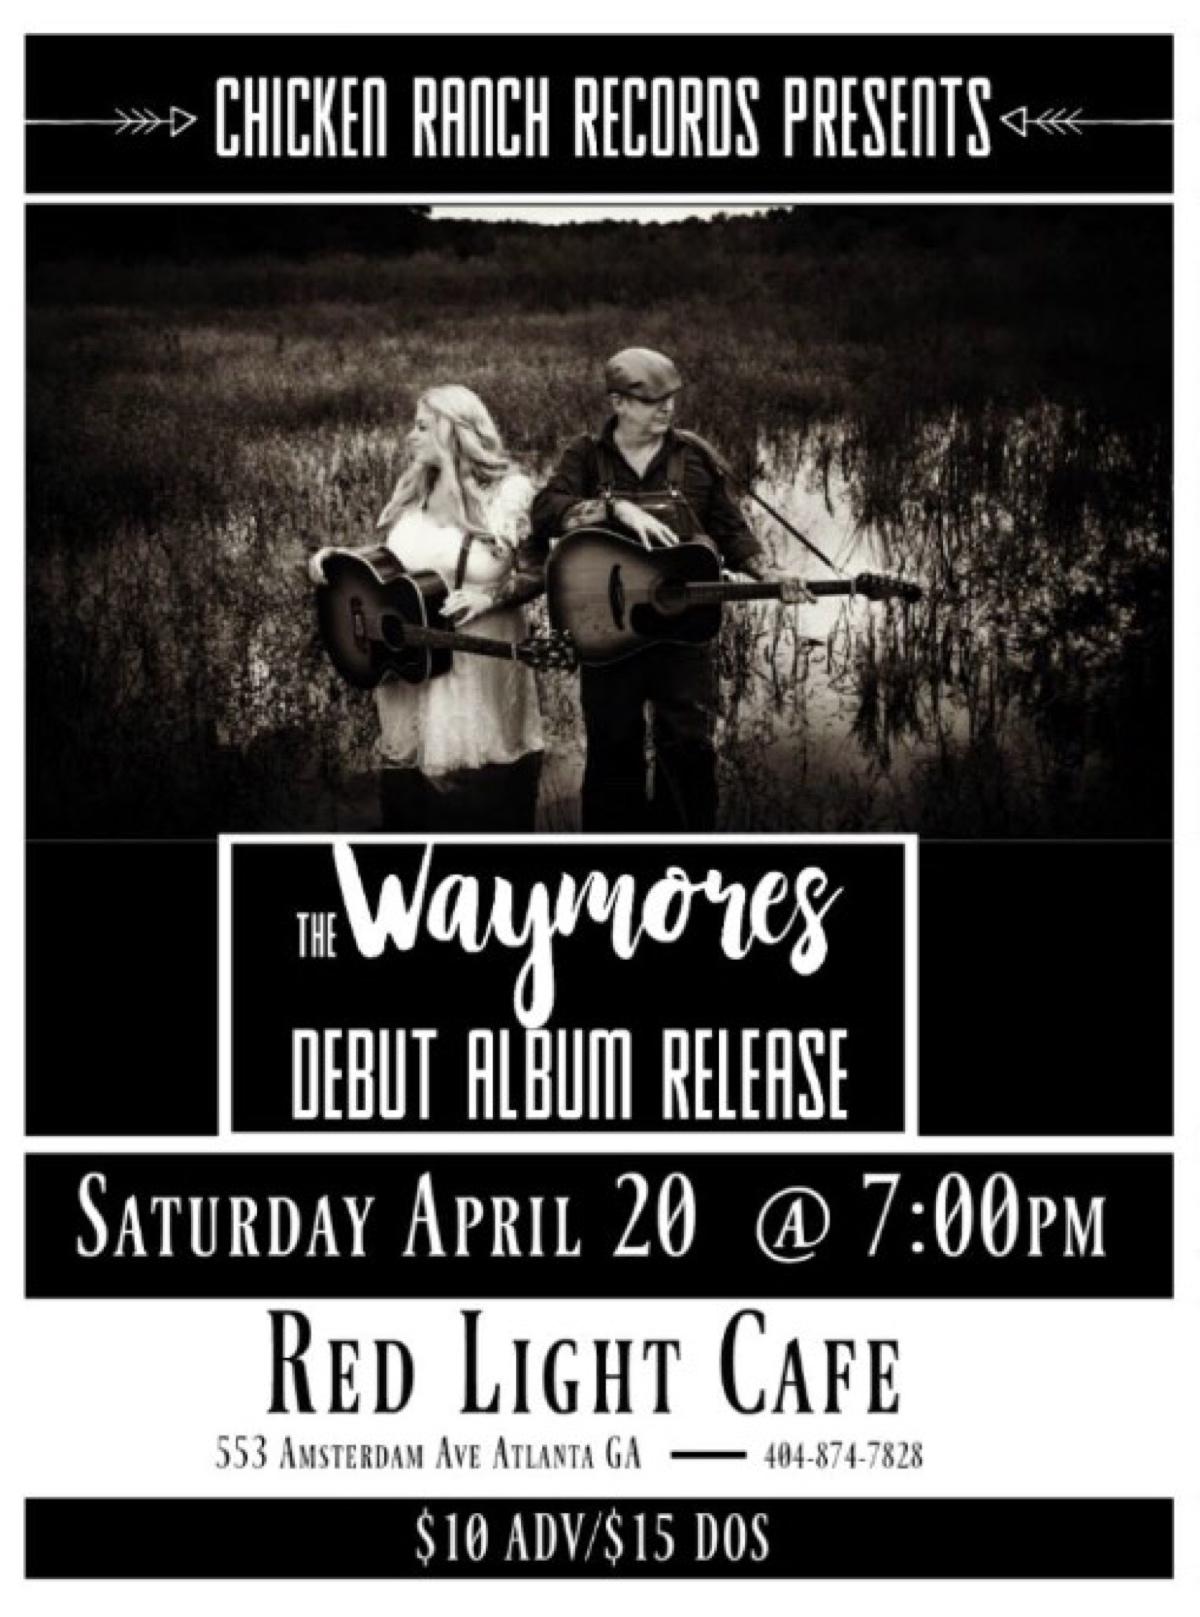 The Waymores Debut Album Release Party — April 20, 2019 — Red Light Café, Atlanta, GA